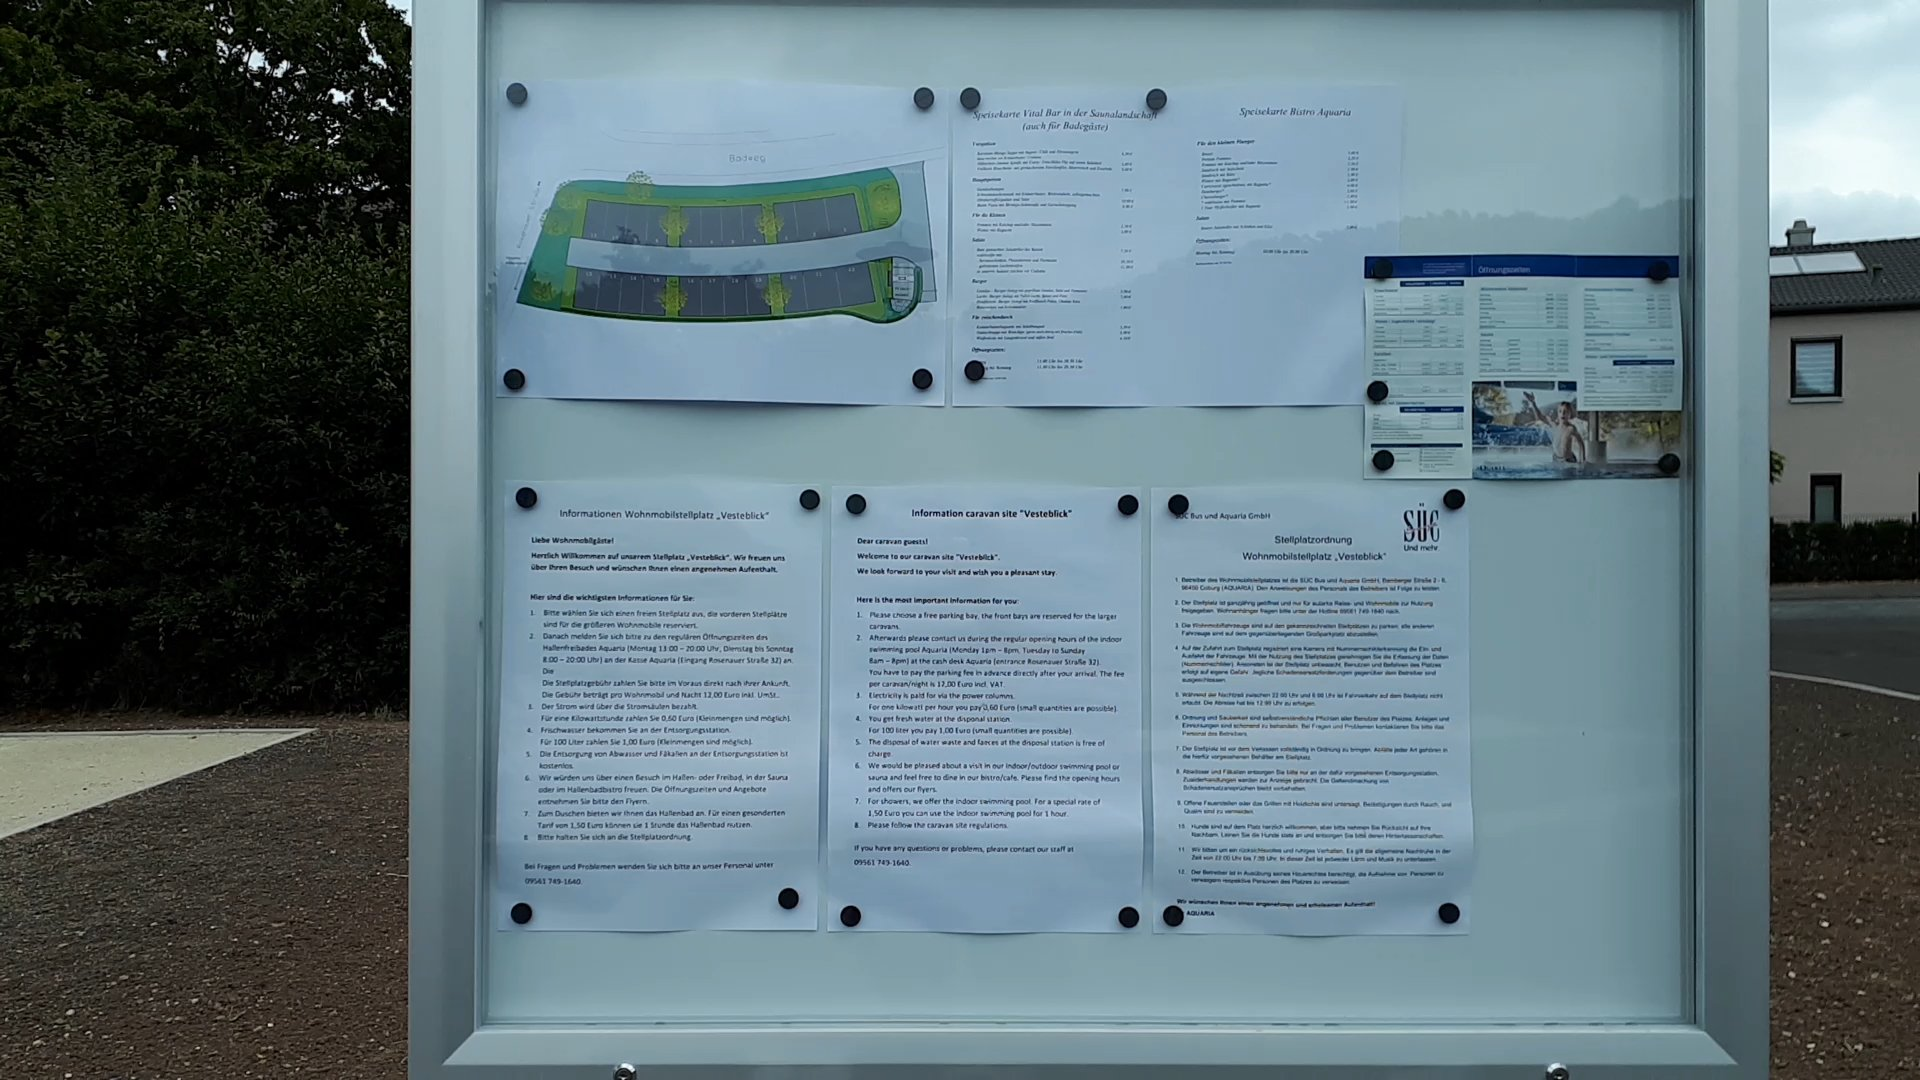 Informationstafel am Eingang